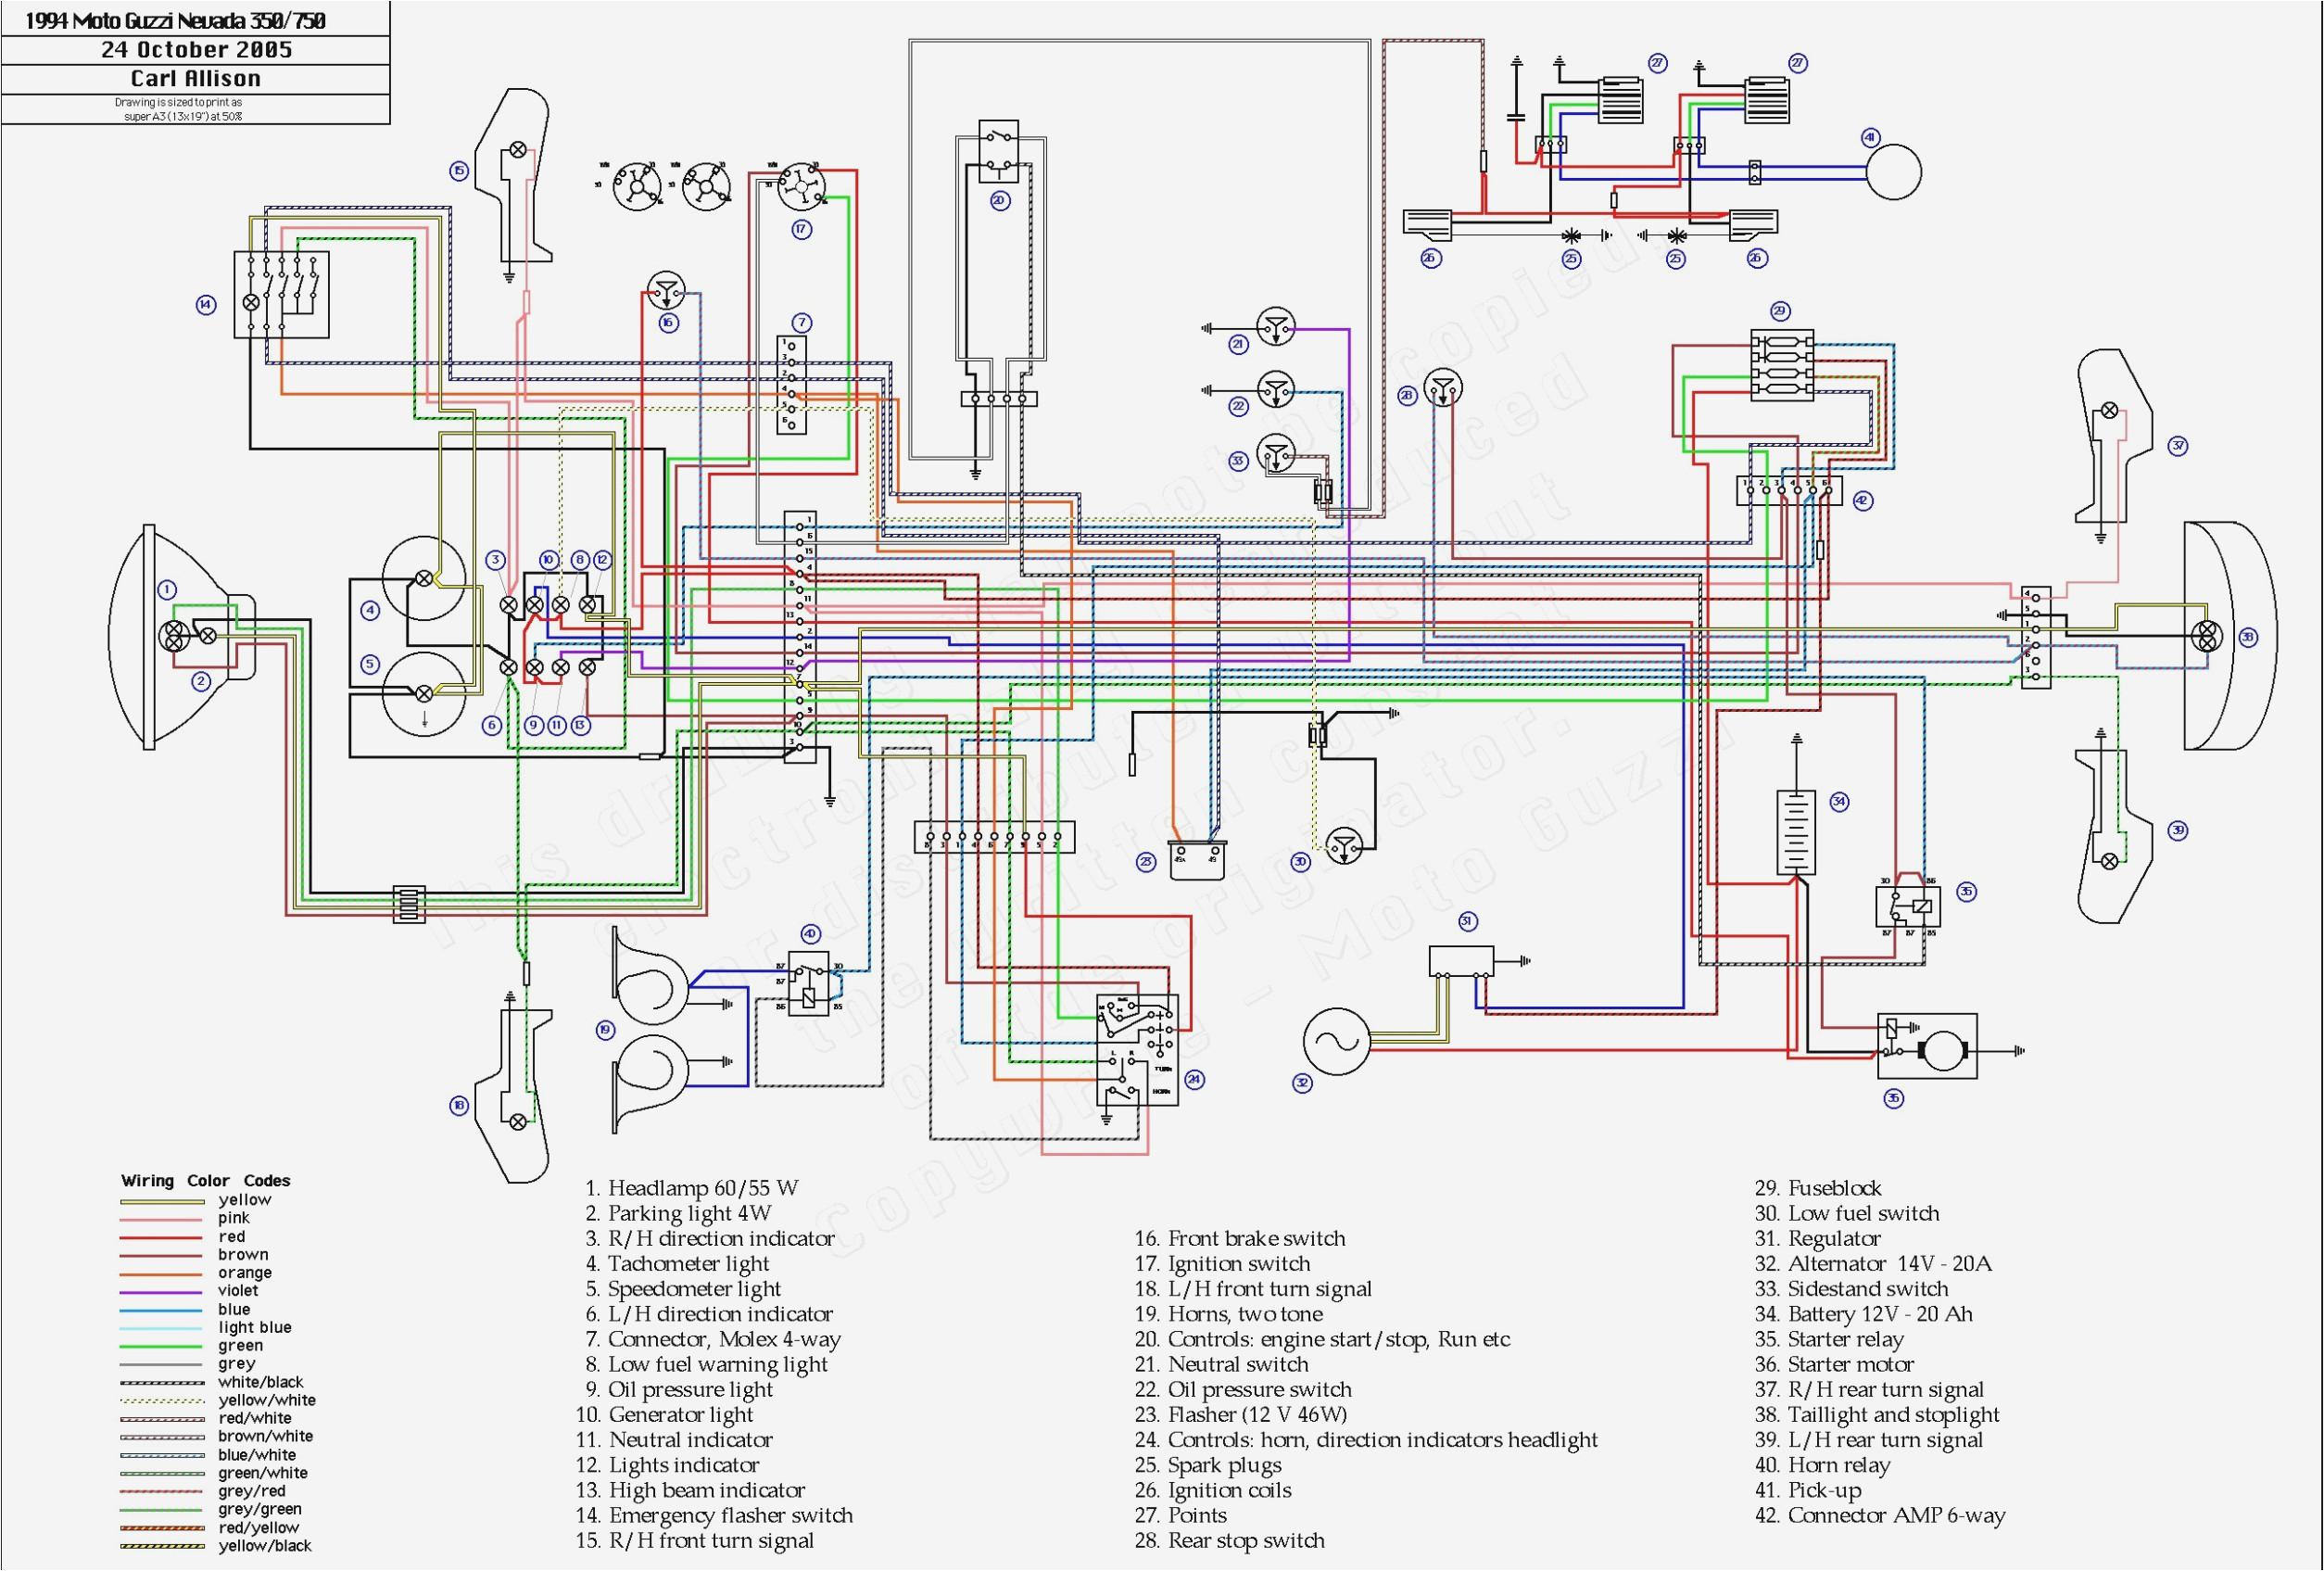 port a cool cyclone wiring diagram 100 wiring diagram database port a cool cyclone wiring diagram 100